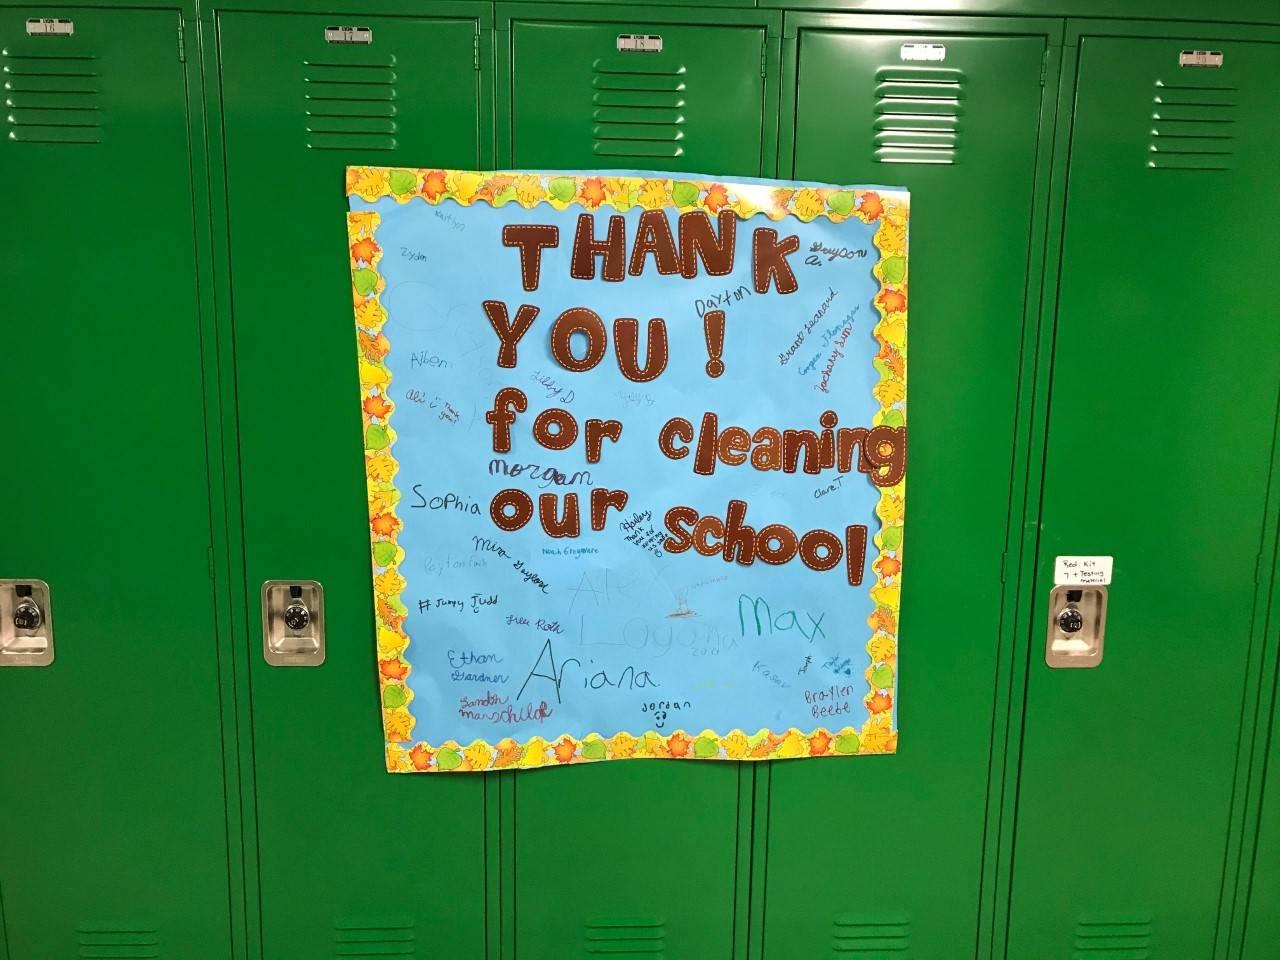 Thank you to custodians photo